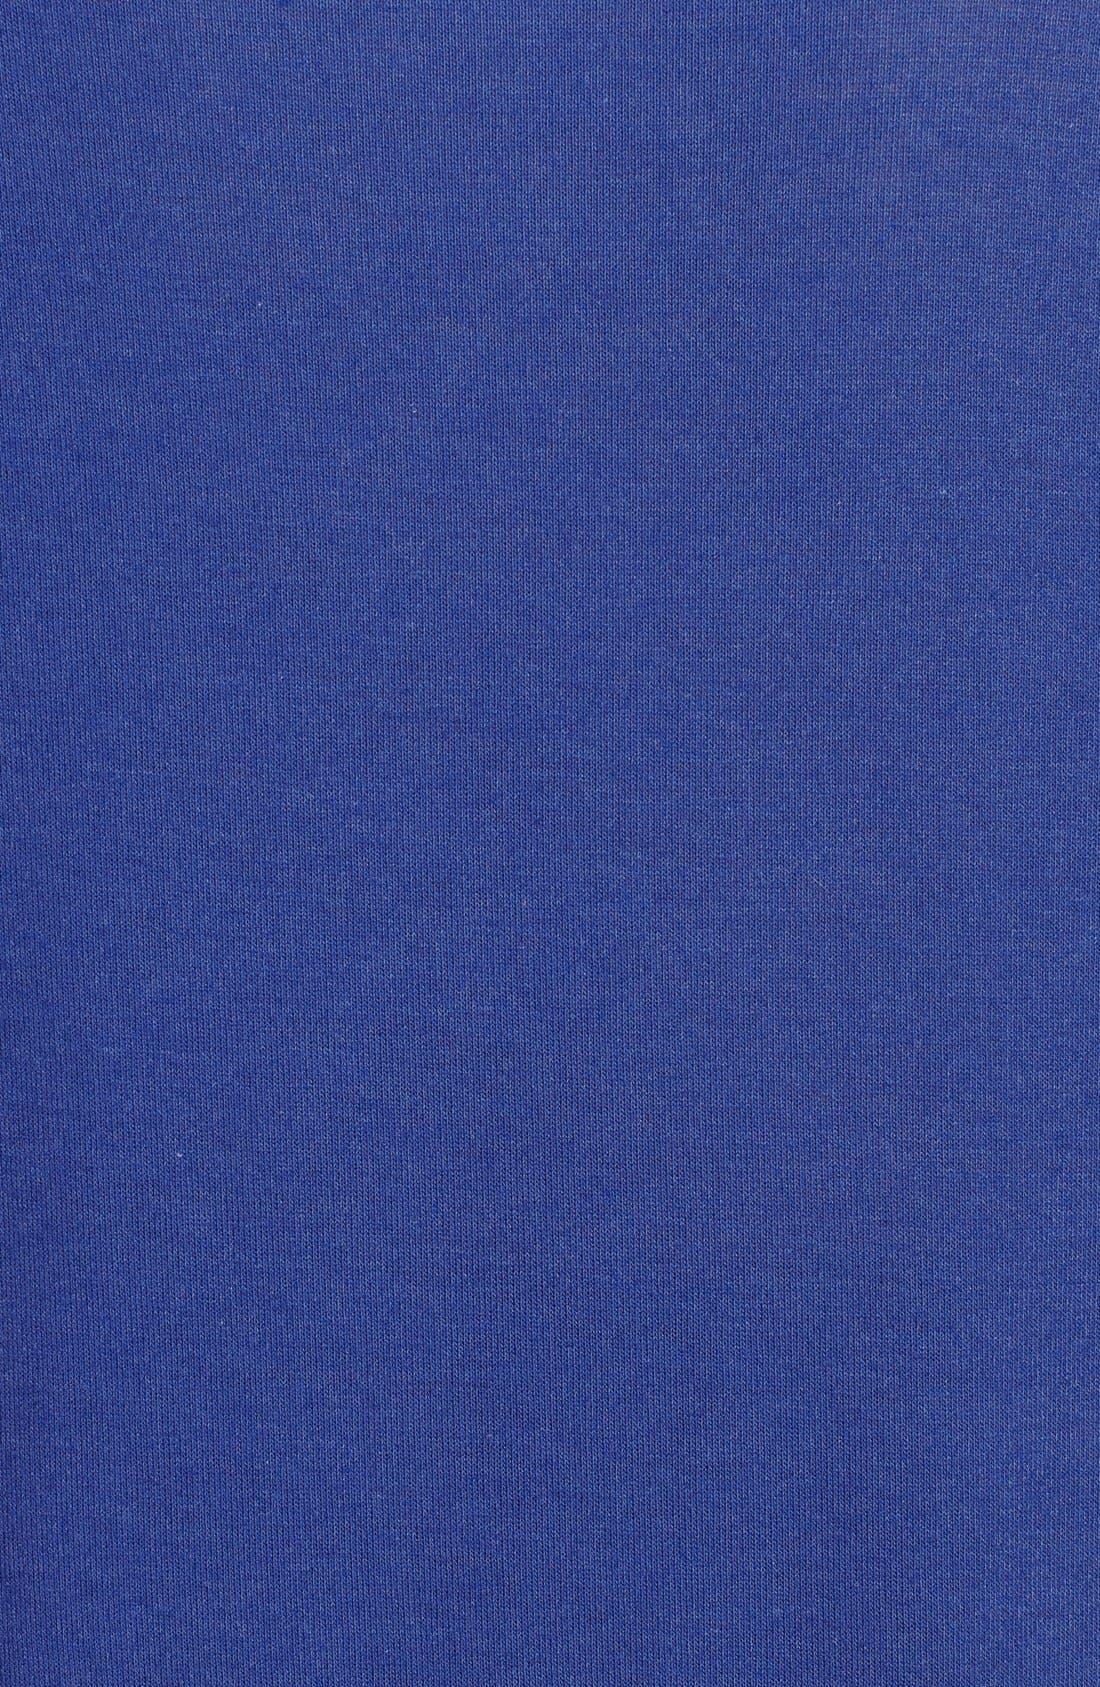 Alternate Image 3  - June & Hudson Long Sleeve Tunic